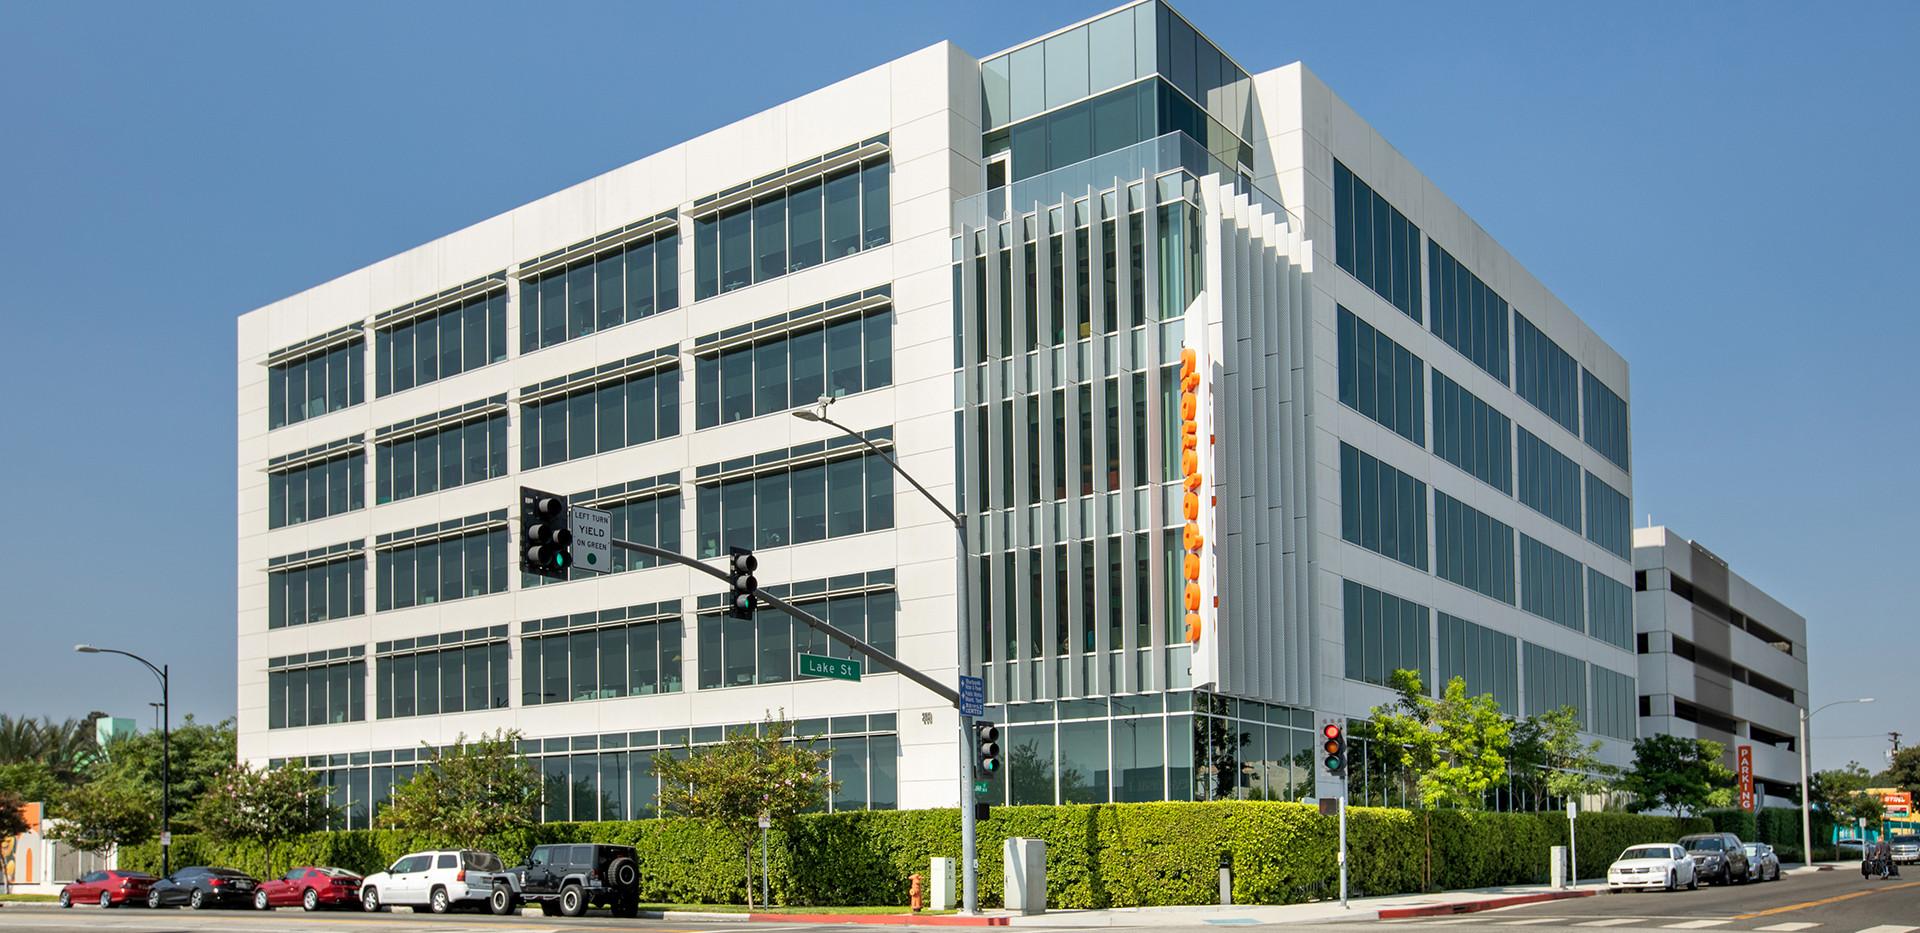 Burbank Nickelodeon Studios